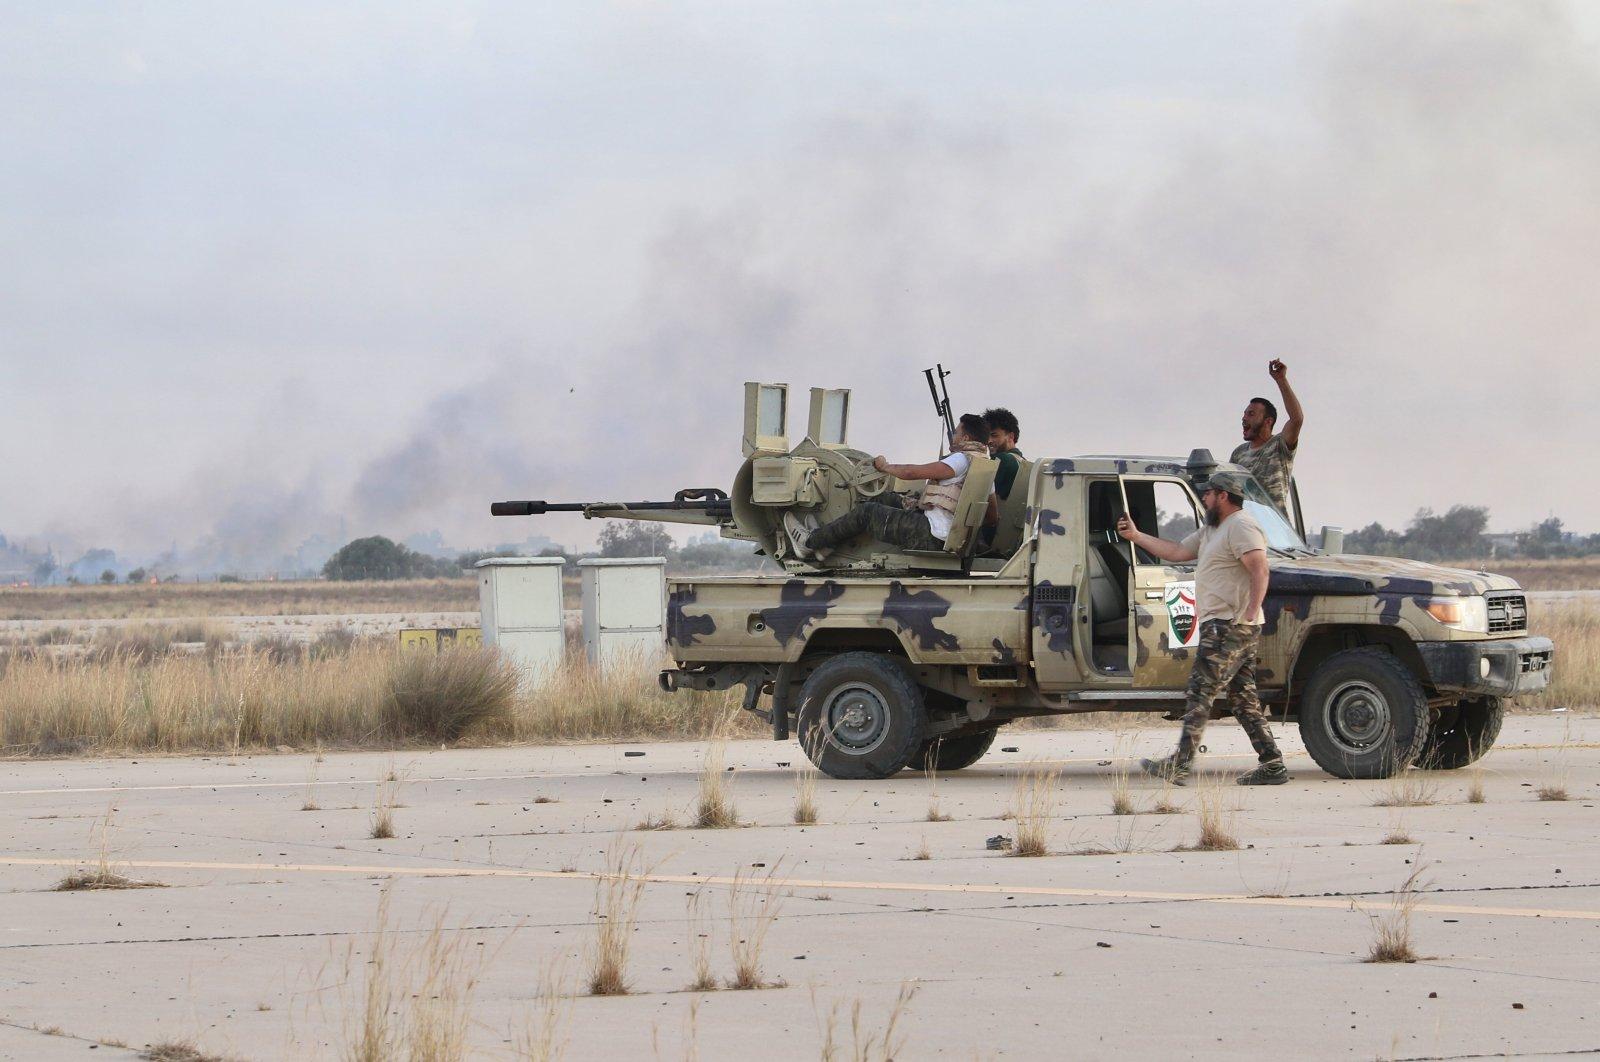 Libyan Army members arrive in Libya's Bani Walid, from which militias loyal to putschist Gen. Khalifa Haftar fled, June 8, 2020. (AA Photo)